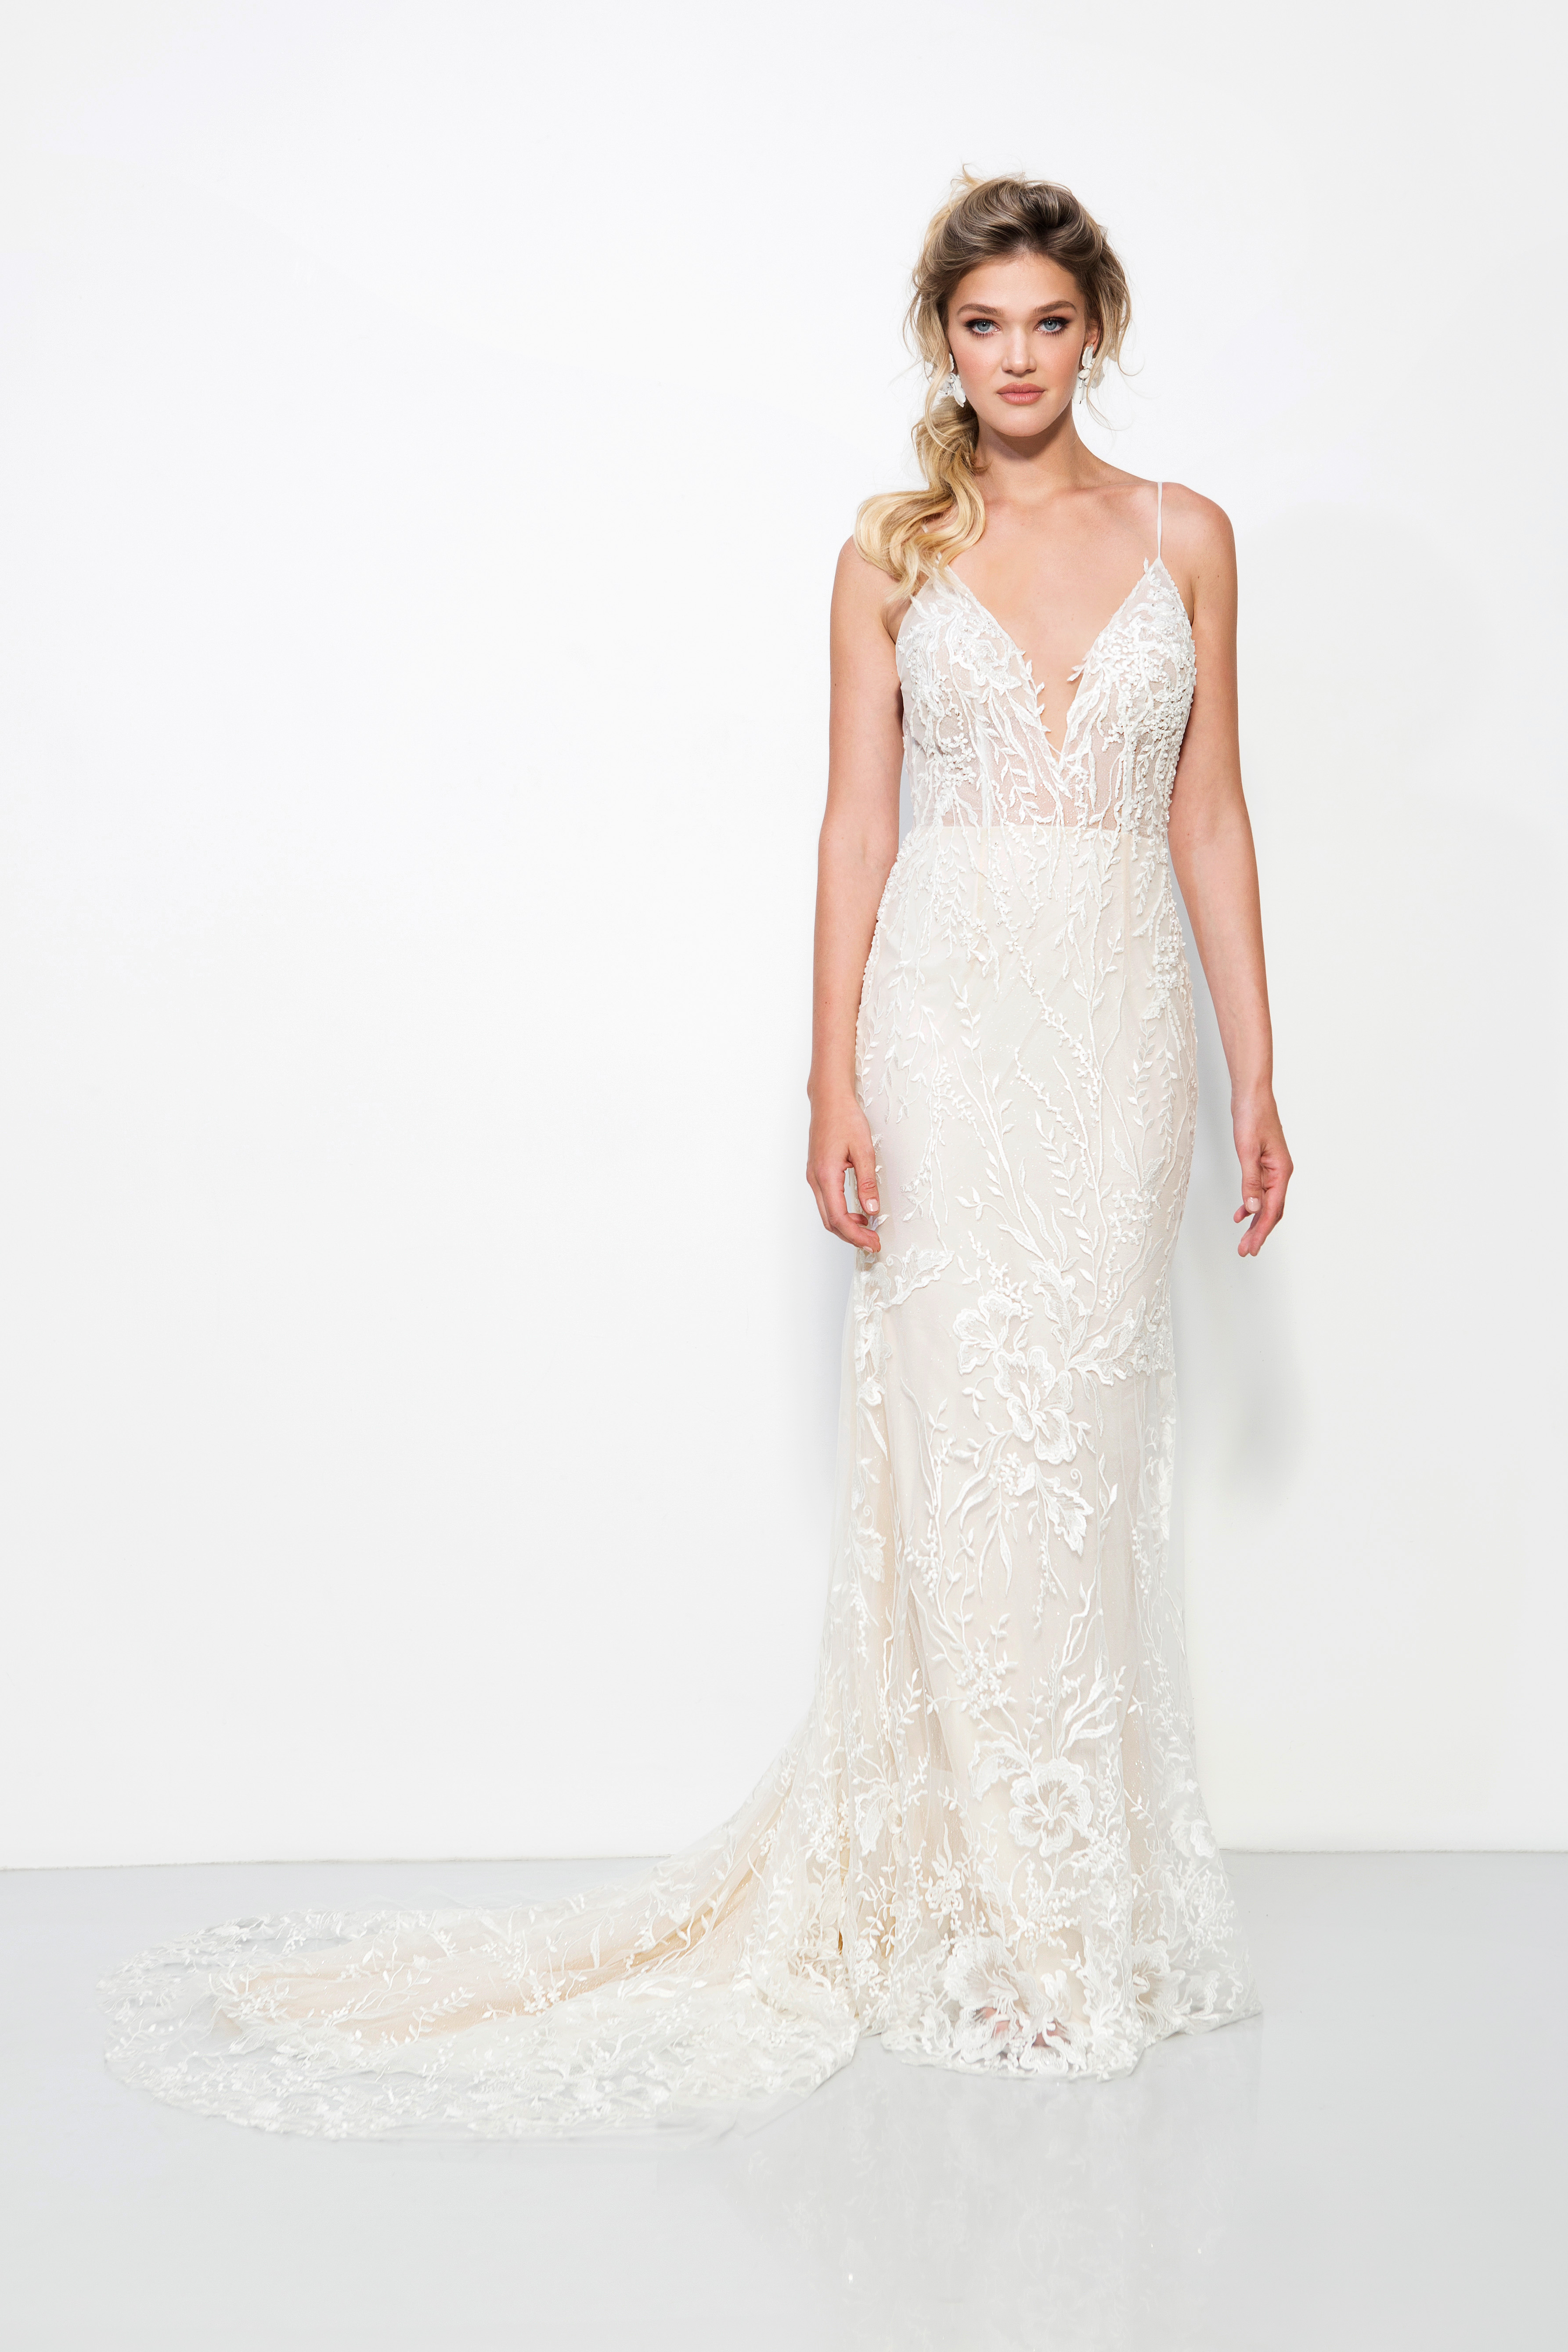 lavish by yaniv persy wedding dress spring 2019 lace spaghetti strap deep v